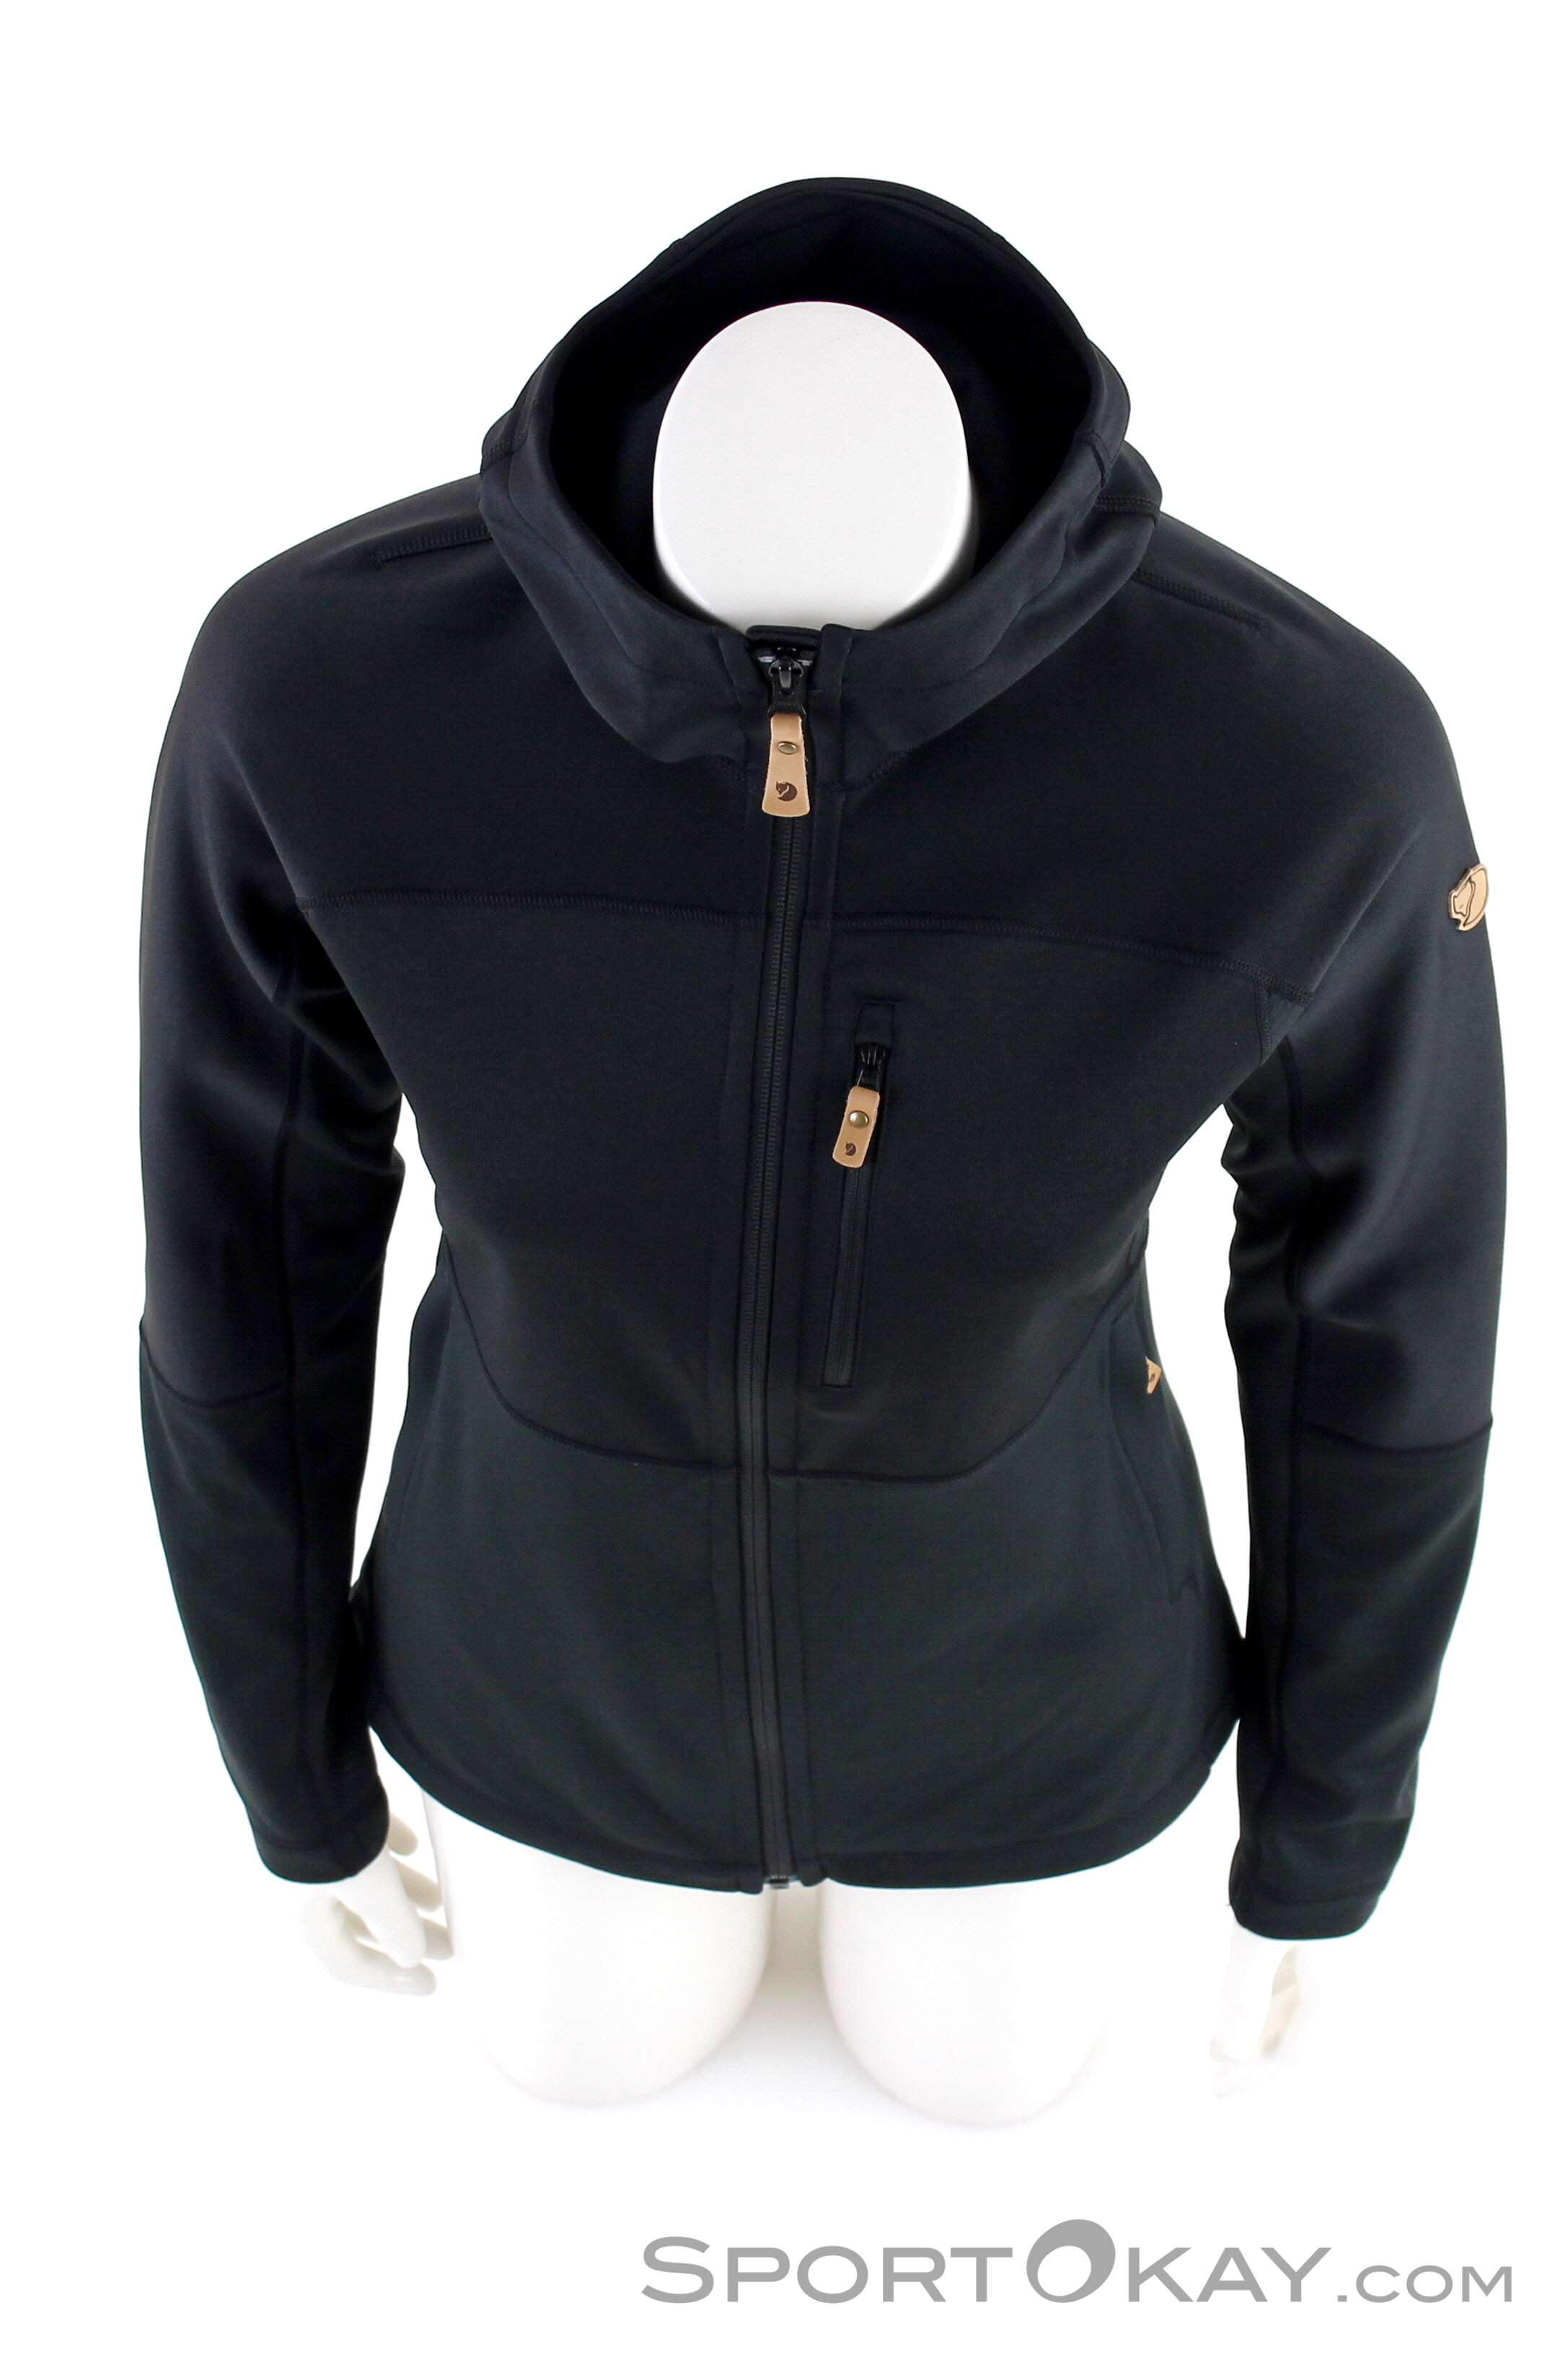 a34bd837bad4e7 Fjällräven Abisko Trail Fleece Damen Outdoorsweater - Sweater ...